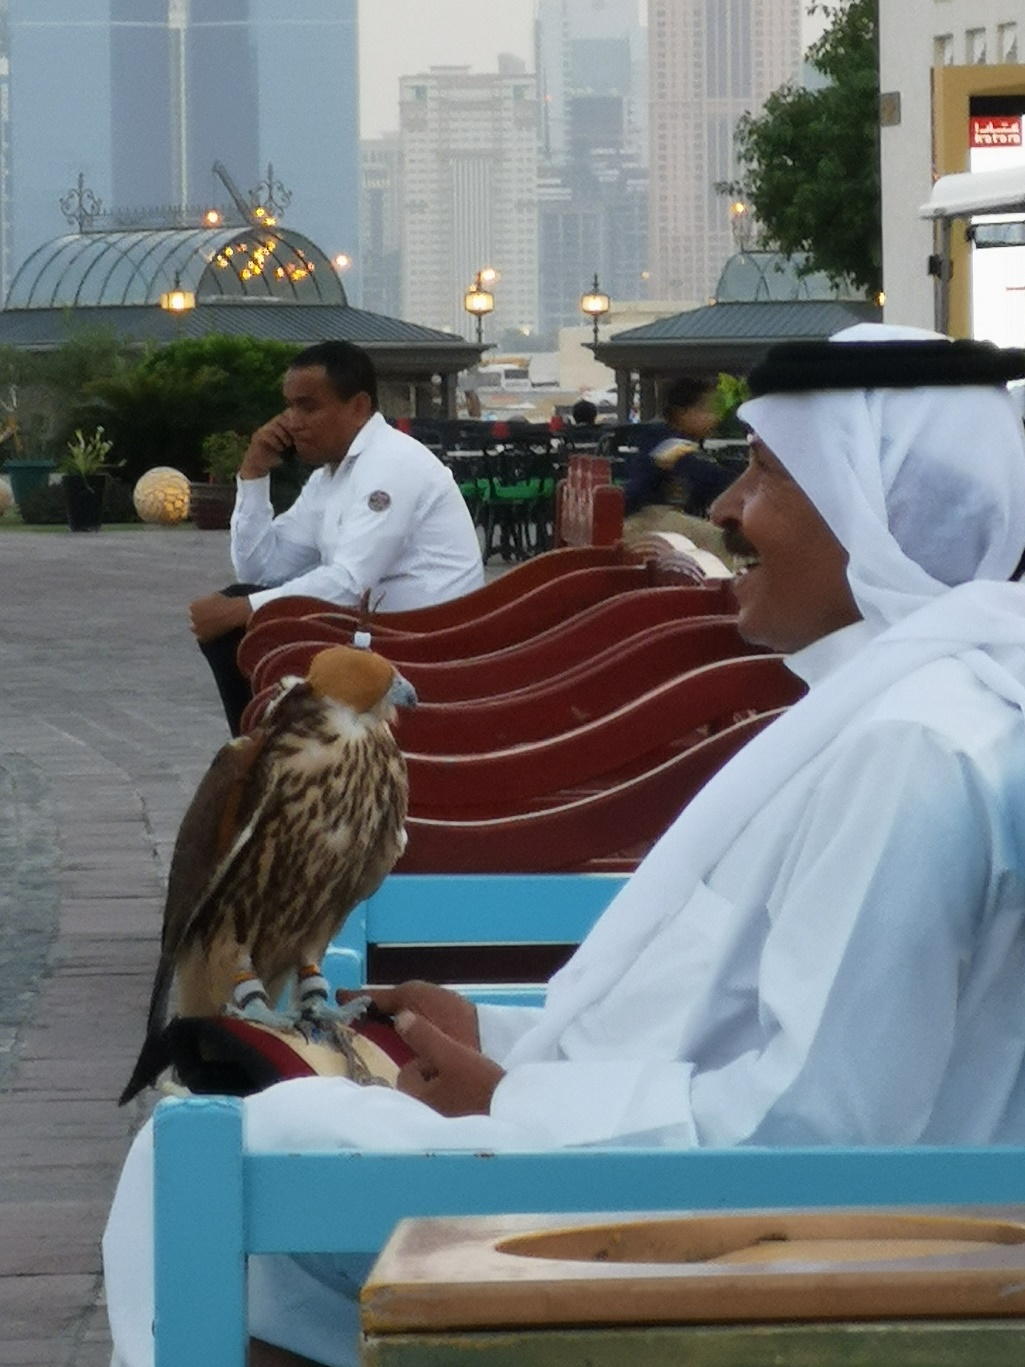 stranica za upoznavanja Doha Katar seunggi yoona dating